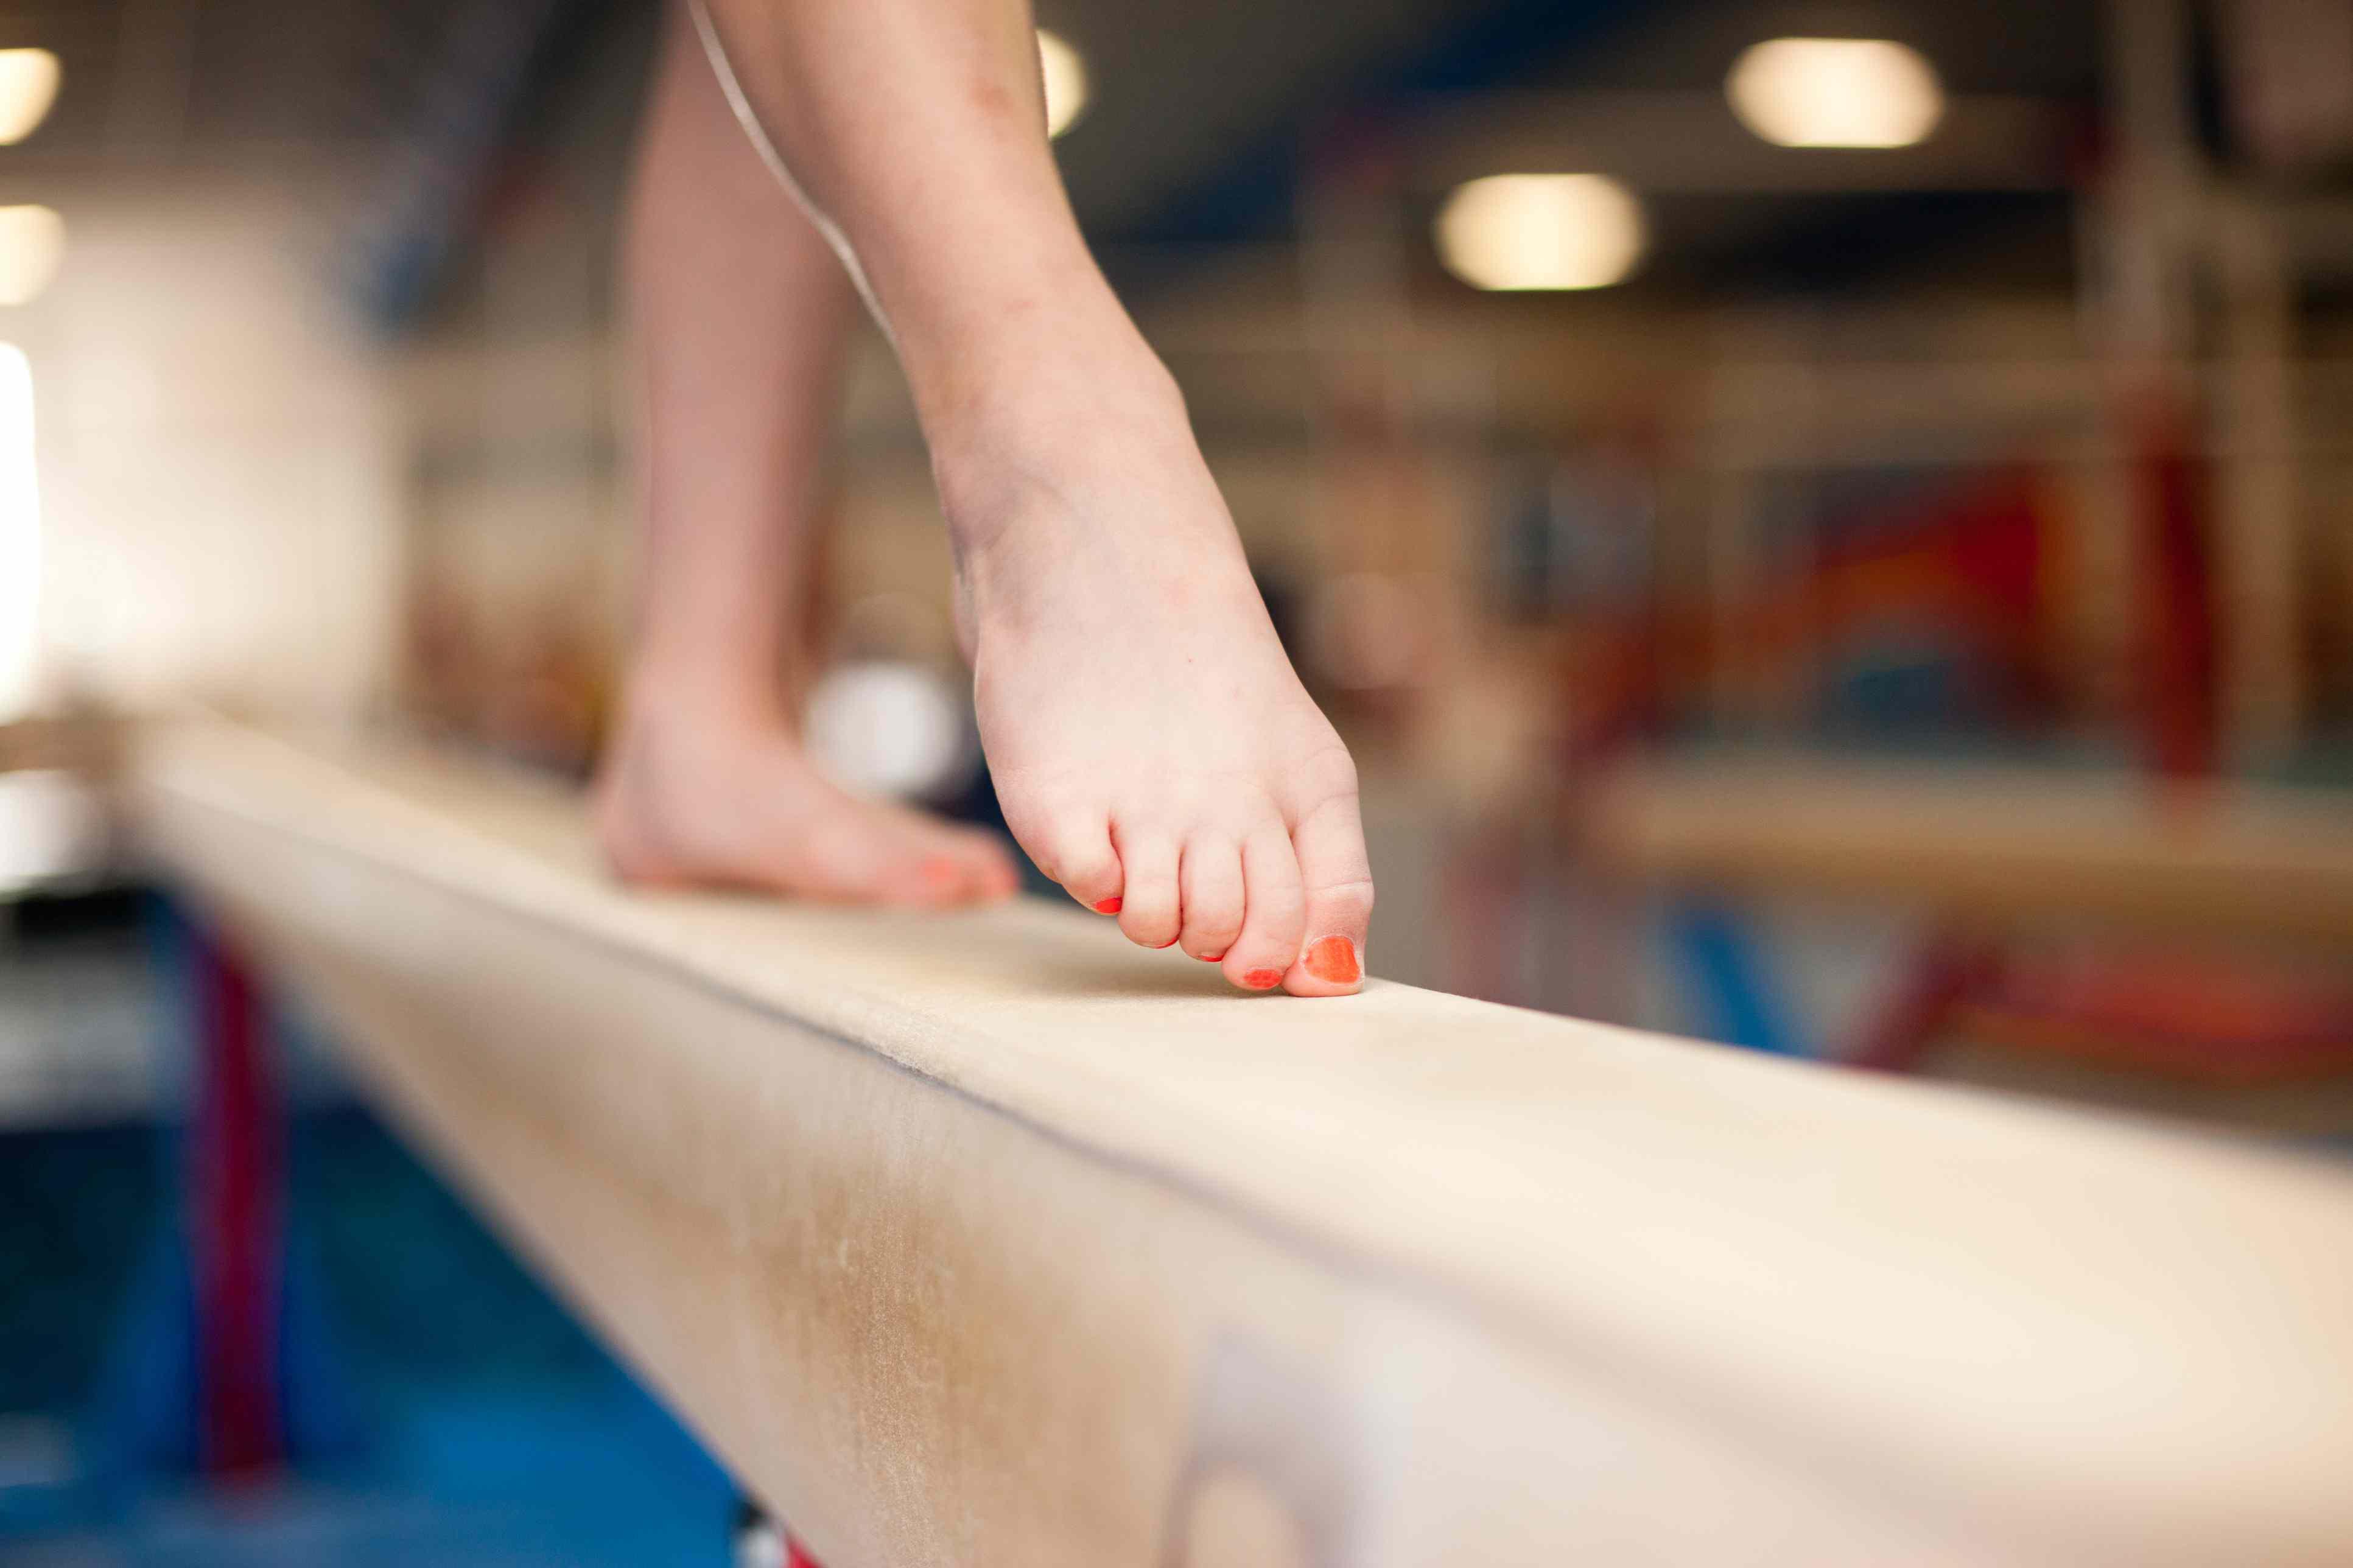 Young Gymnast Toes on Balance Beam